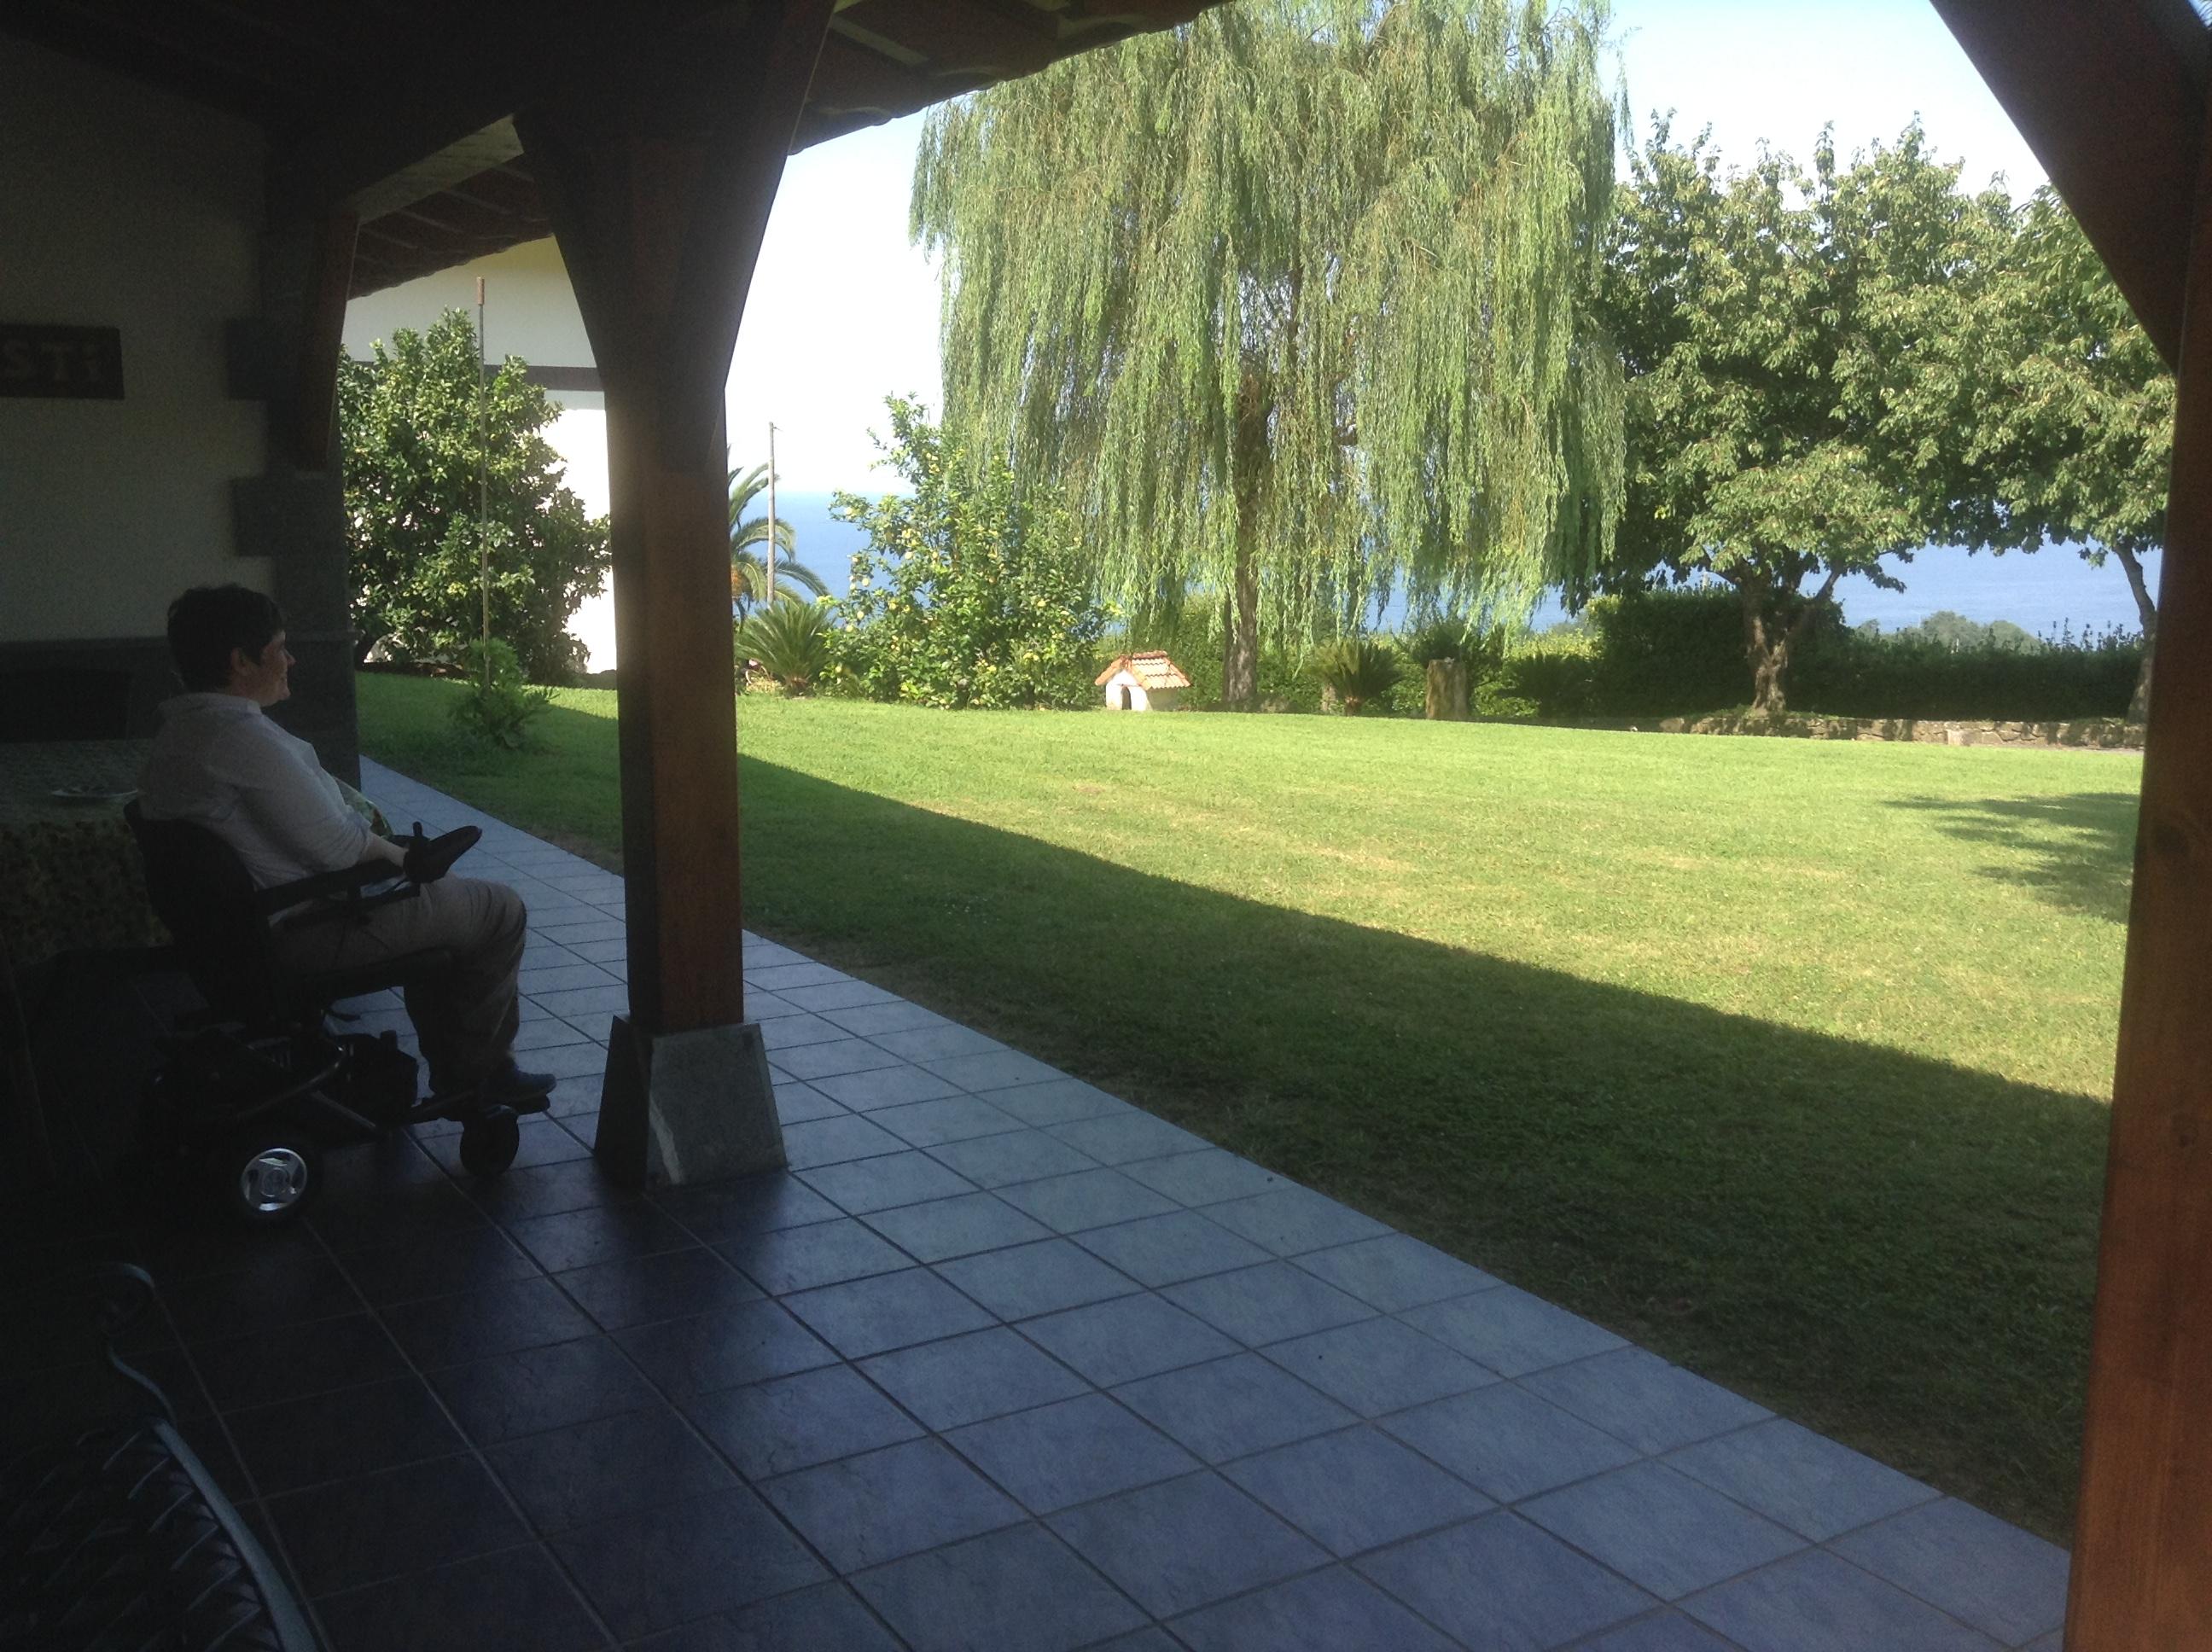 The terrace, Mahastí, Epotx Etxea, Getaria, Pais Vasco